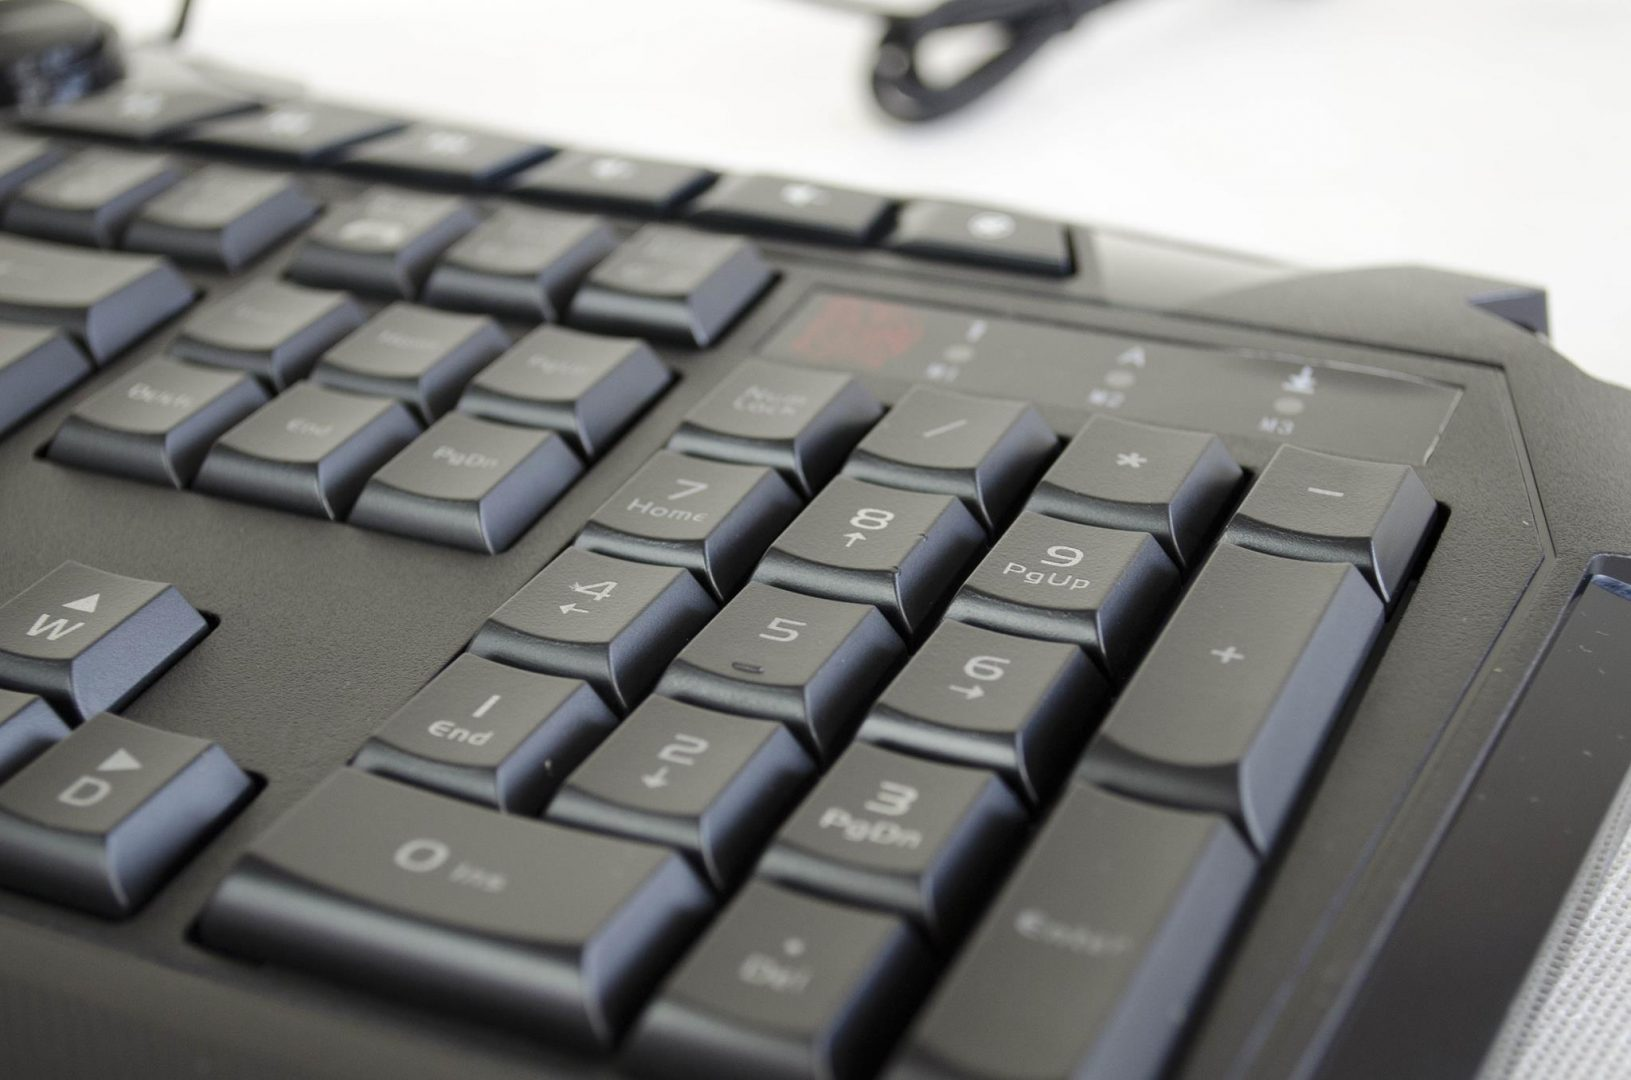 Tt eSPORTS Challenger Prime Gaming Keyboard_6